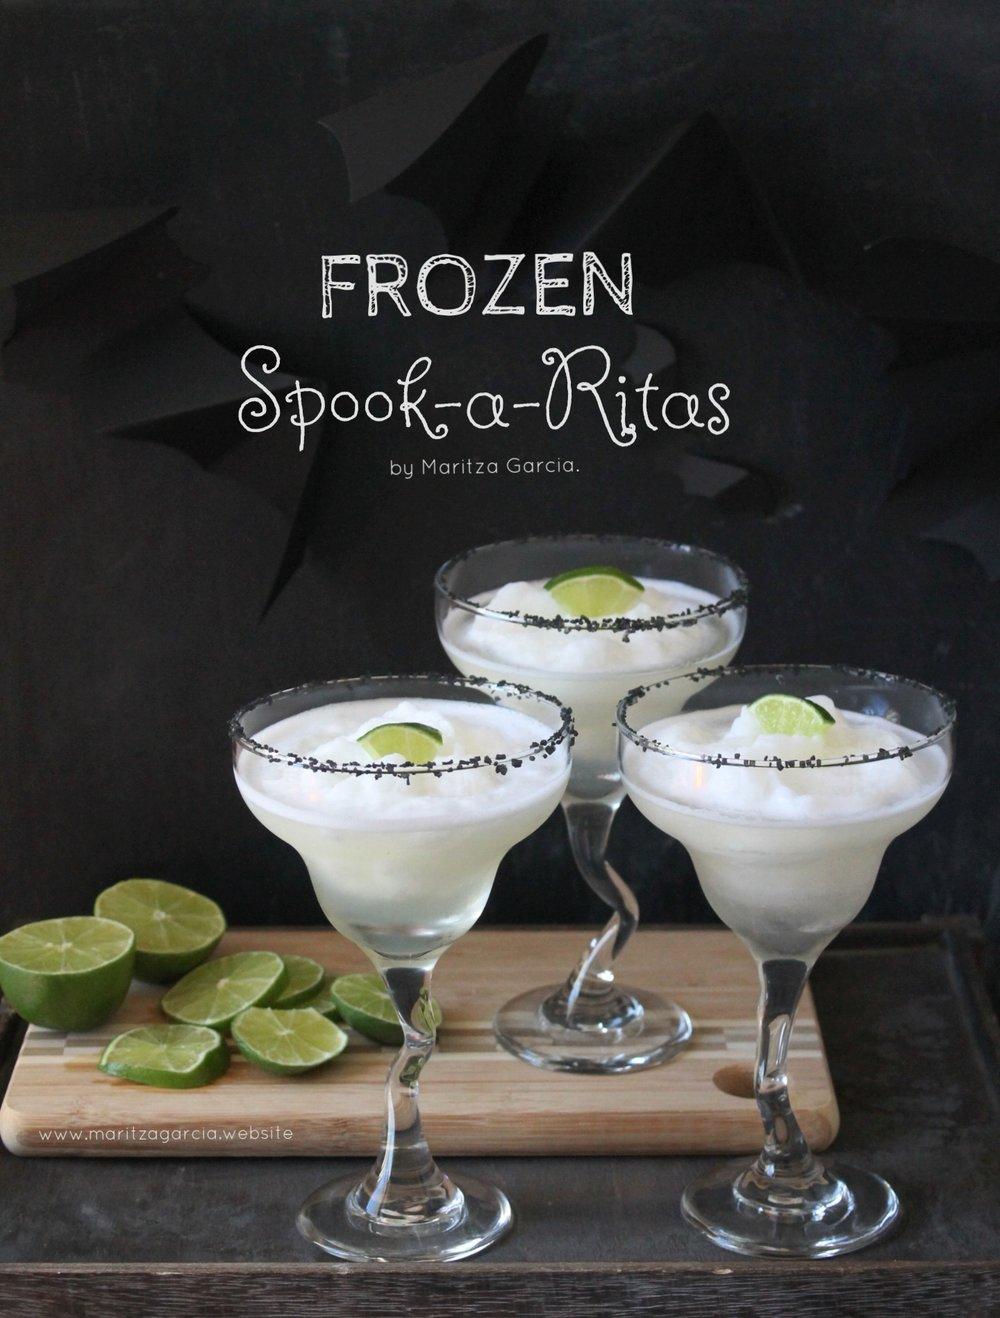 Frozen Spook-a-Ritas by Maritza Garcia.